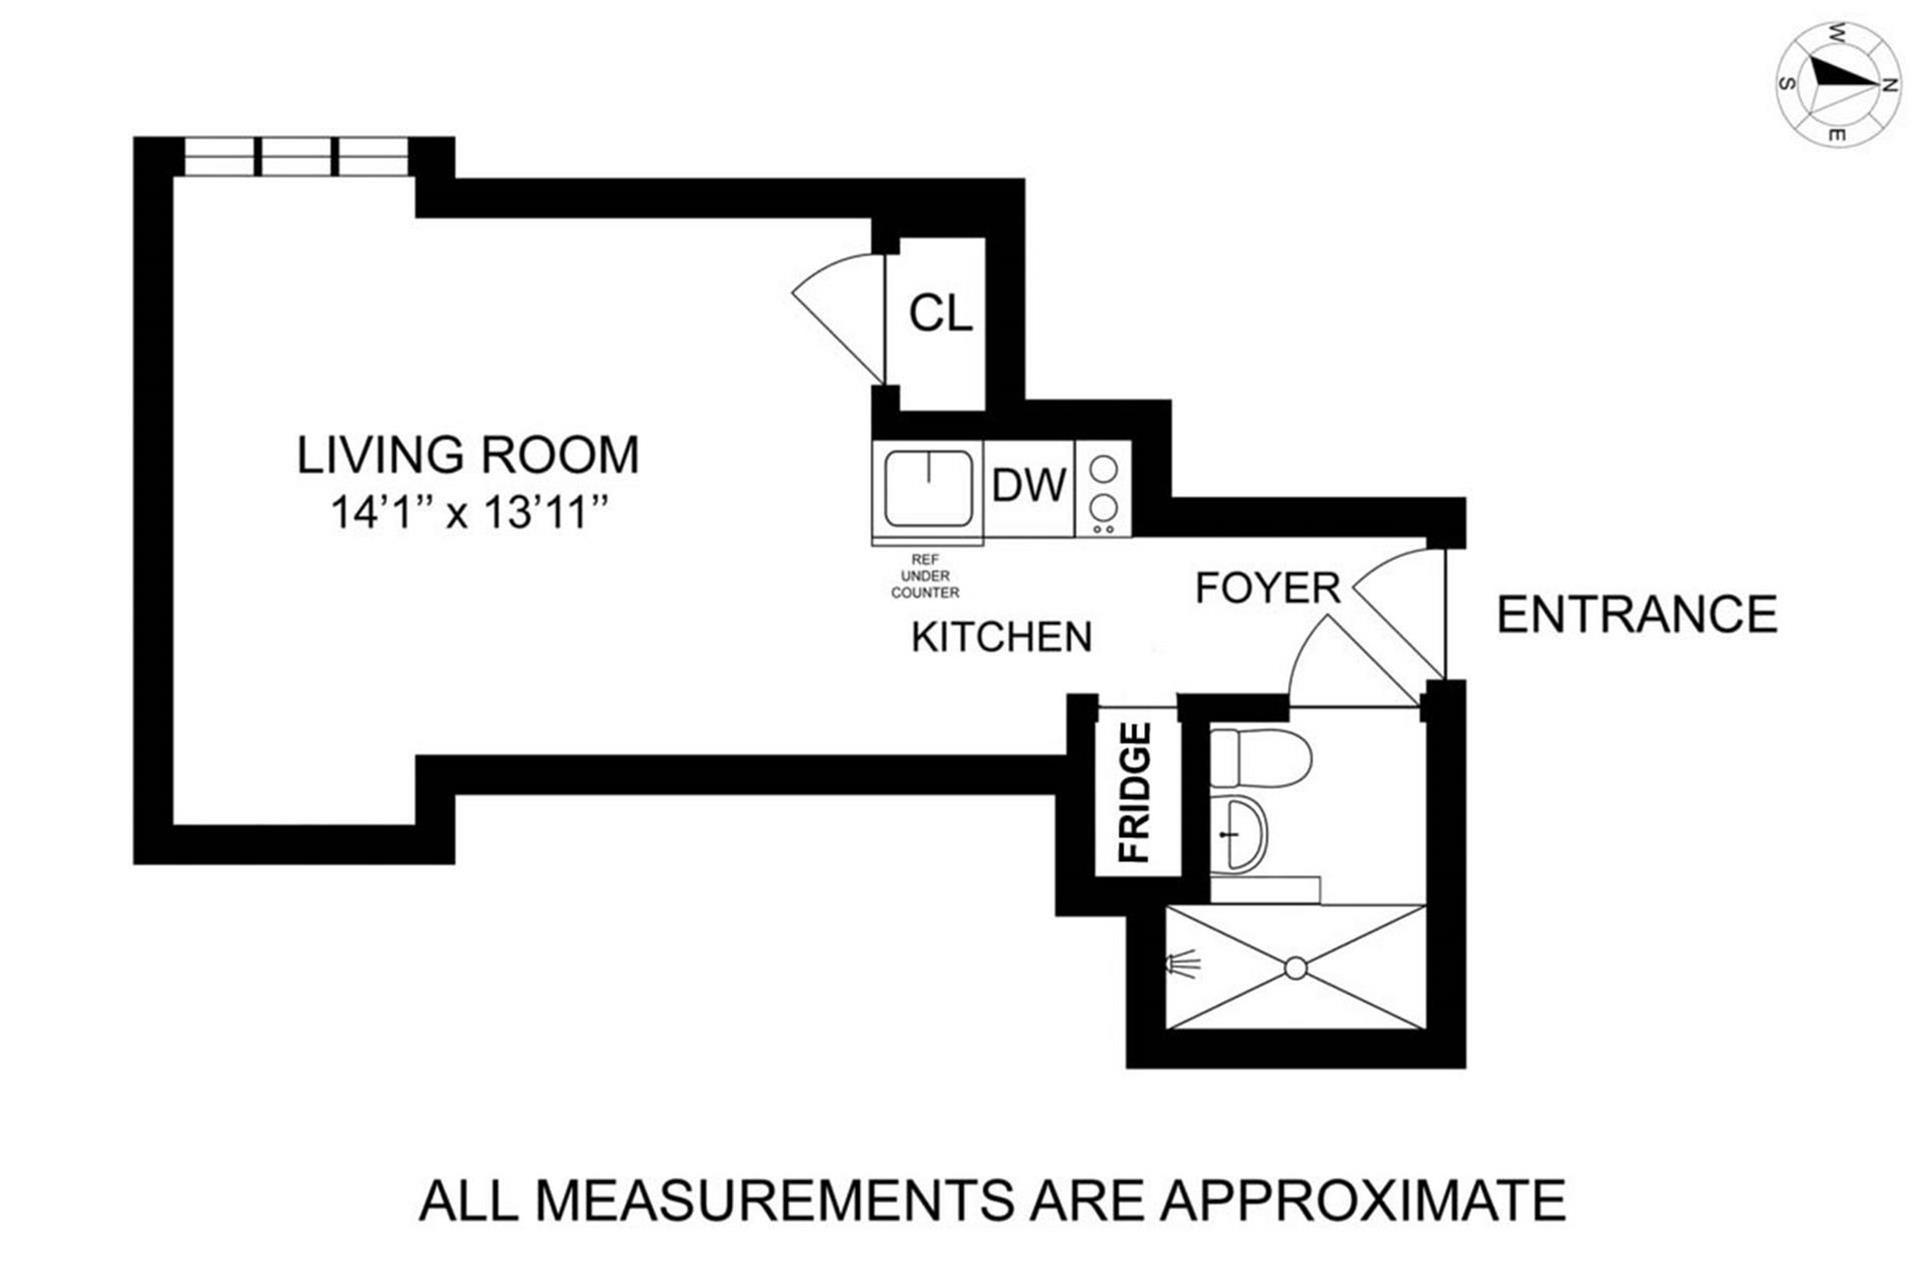 Floor plan of TUDOR TOWER, 25 Tudor City Pl, 807 - Murray Hill, New York